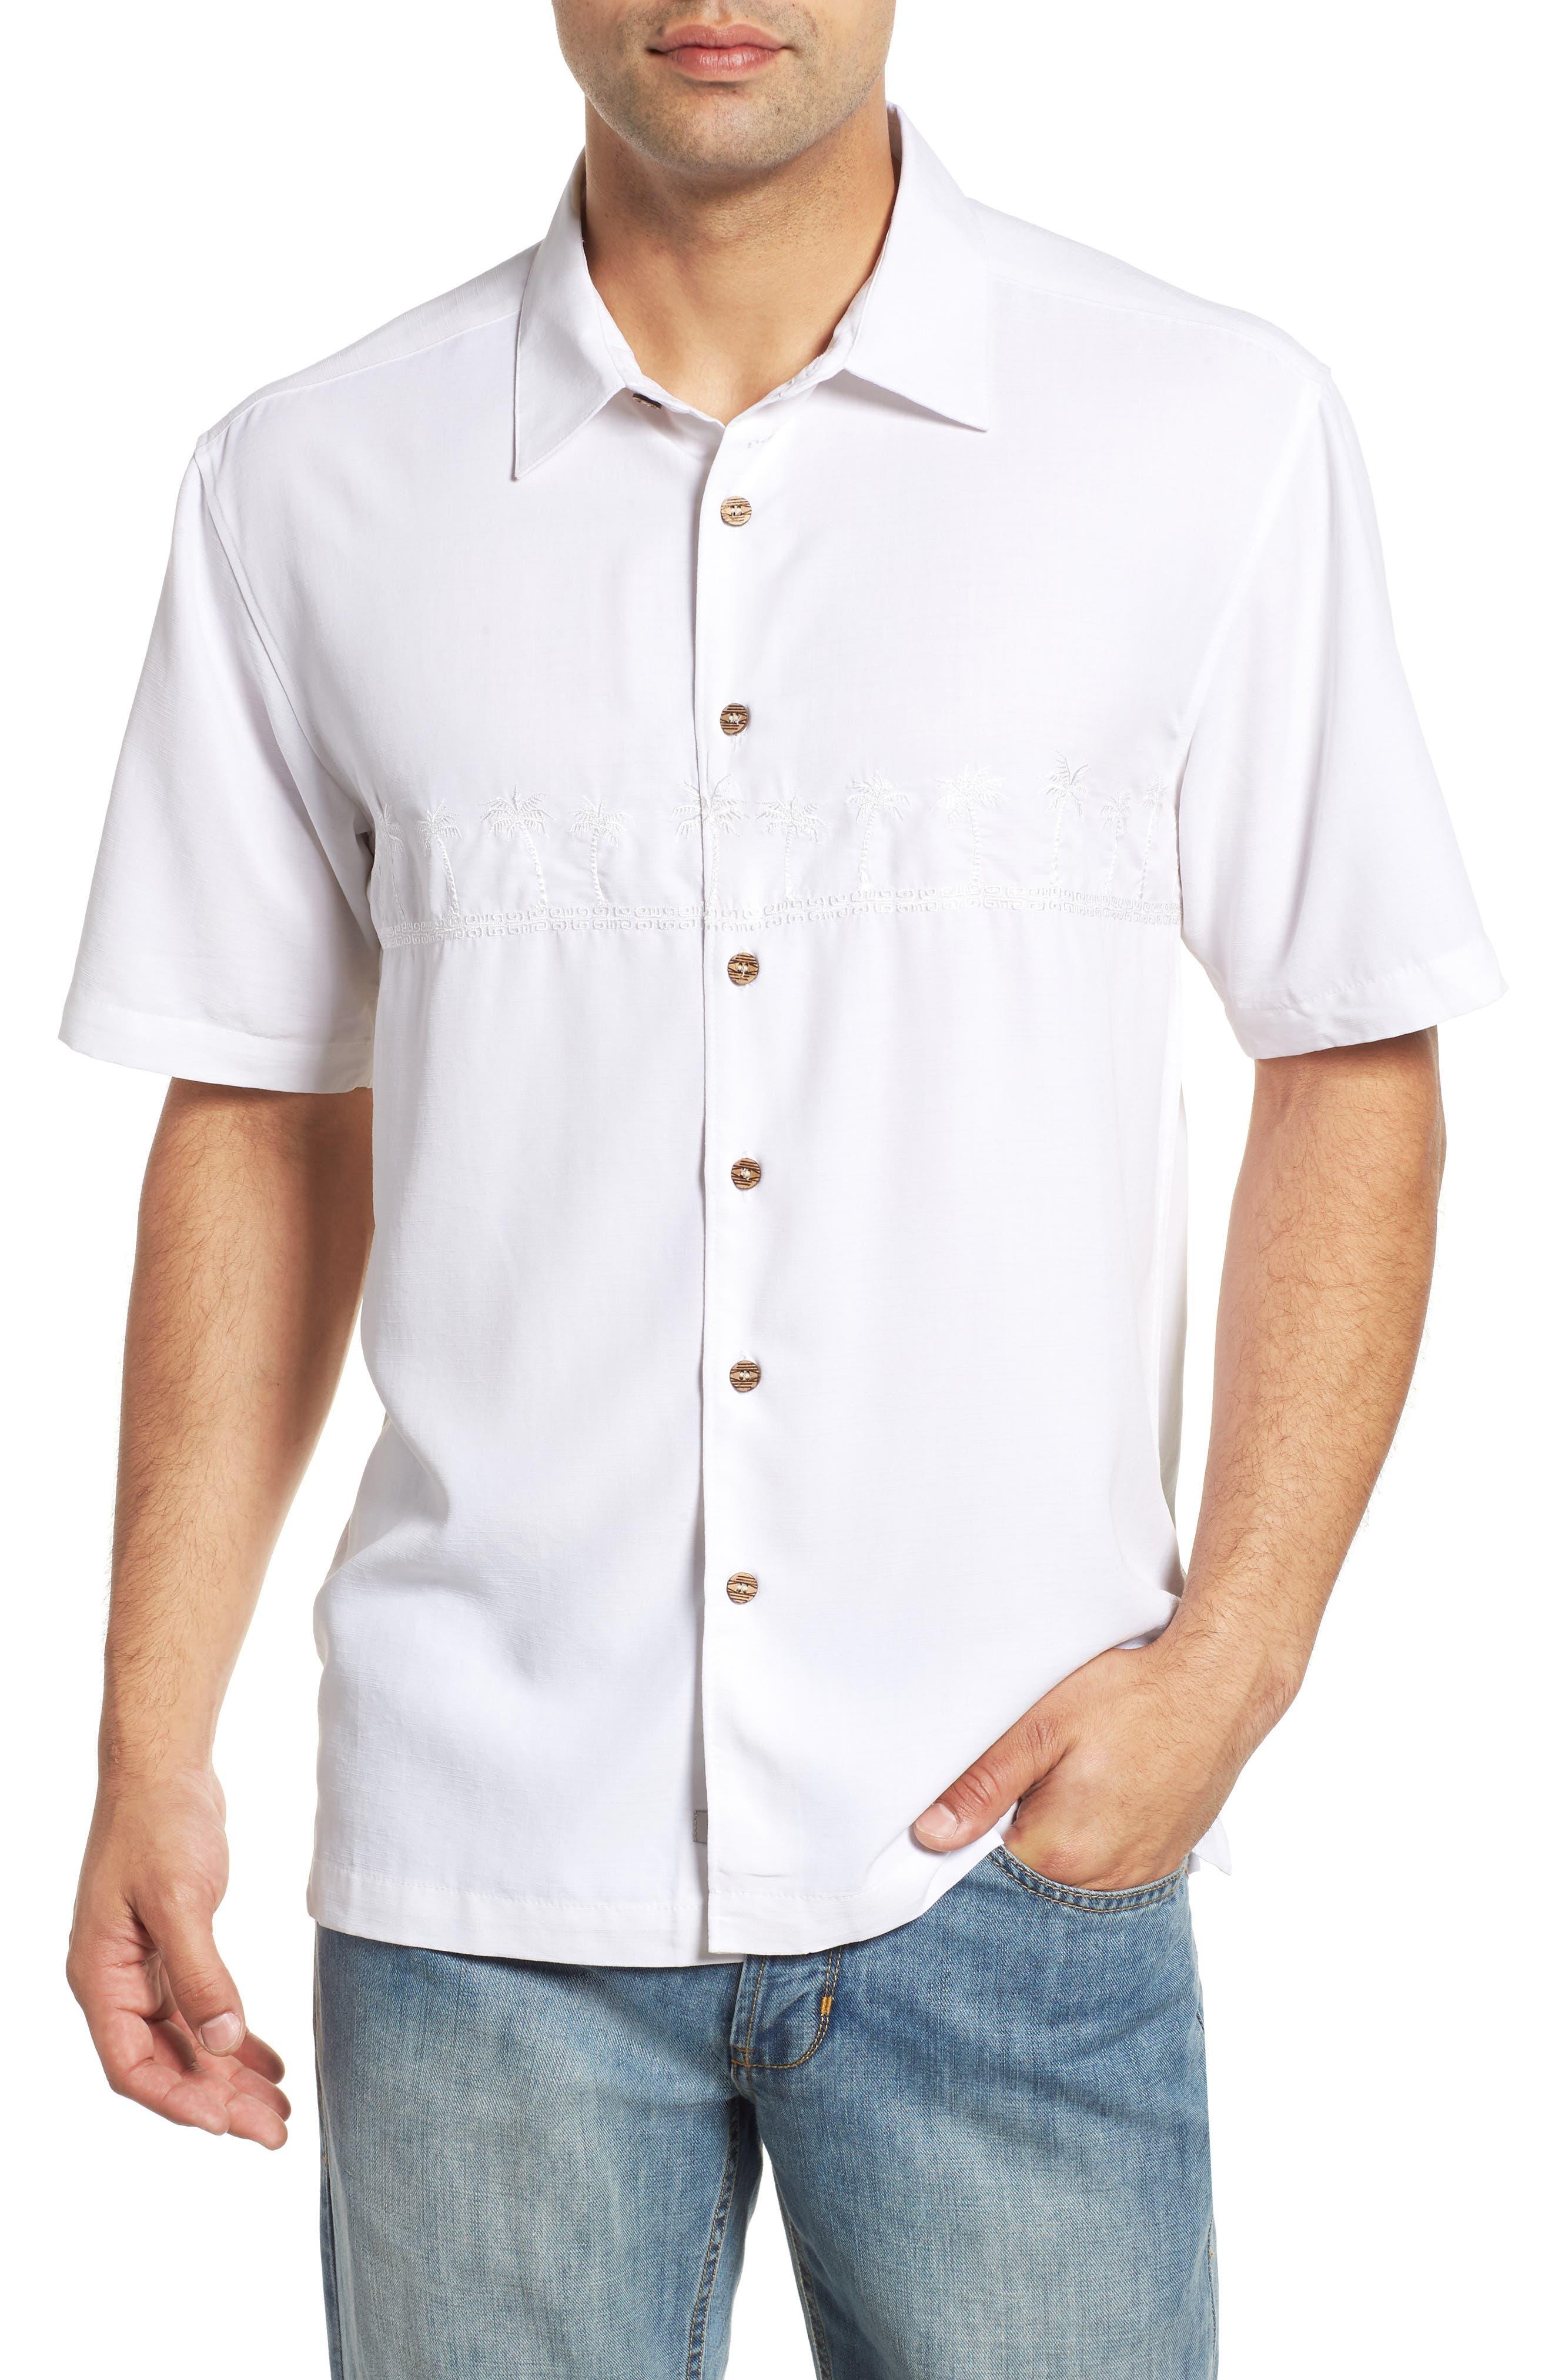 QUIKSILVER WATERMAN COLLECTION,                             Tahiti Palms Regular Fit Sport Shirt,                             Main thumbnail 1, color,                             WHITE